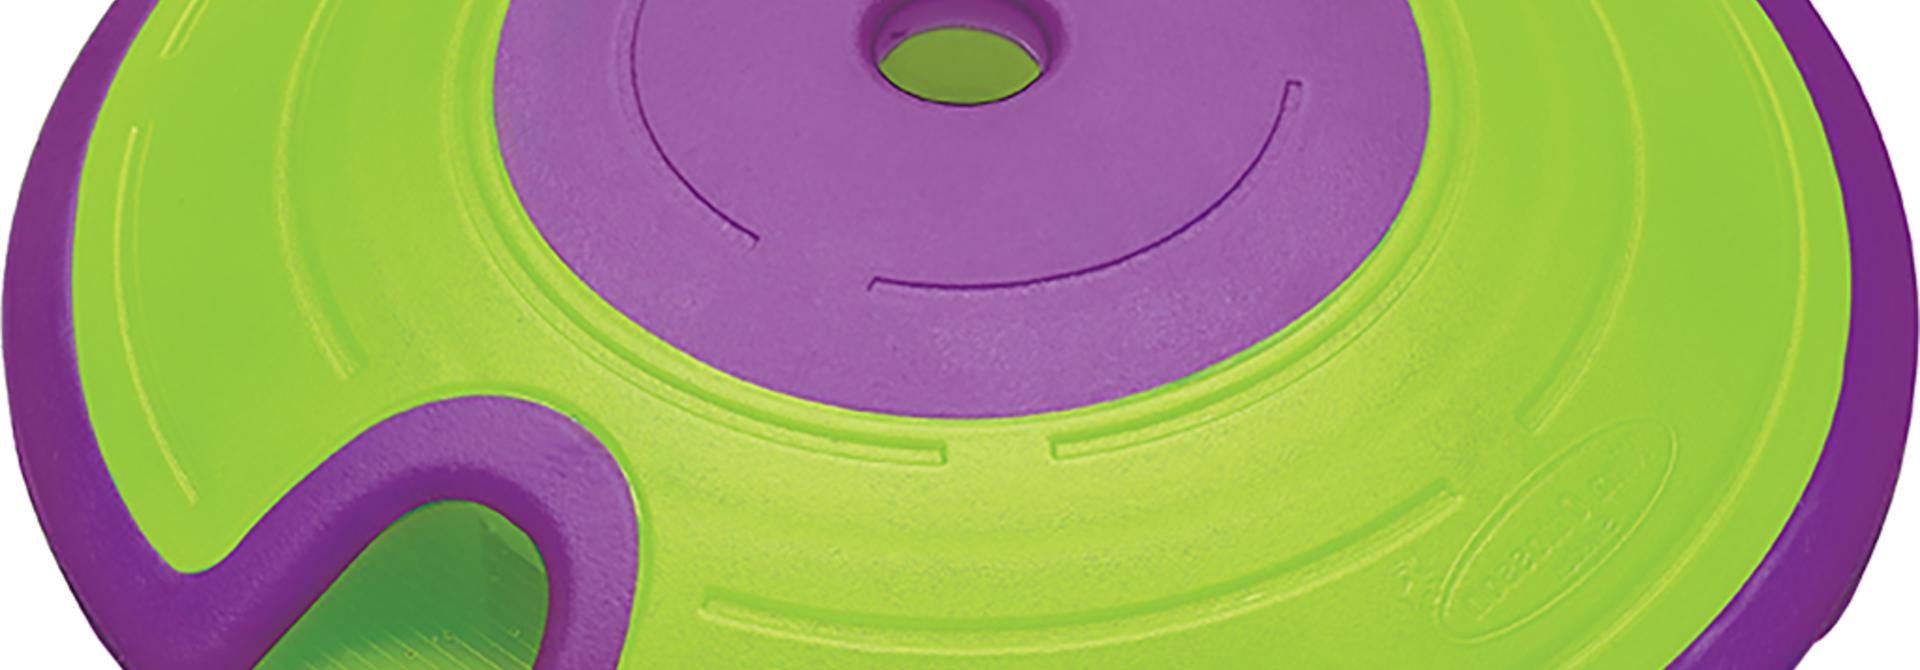 Treat Maze Green & Purple Puzzle